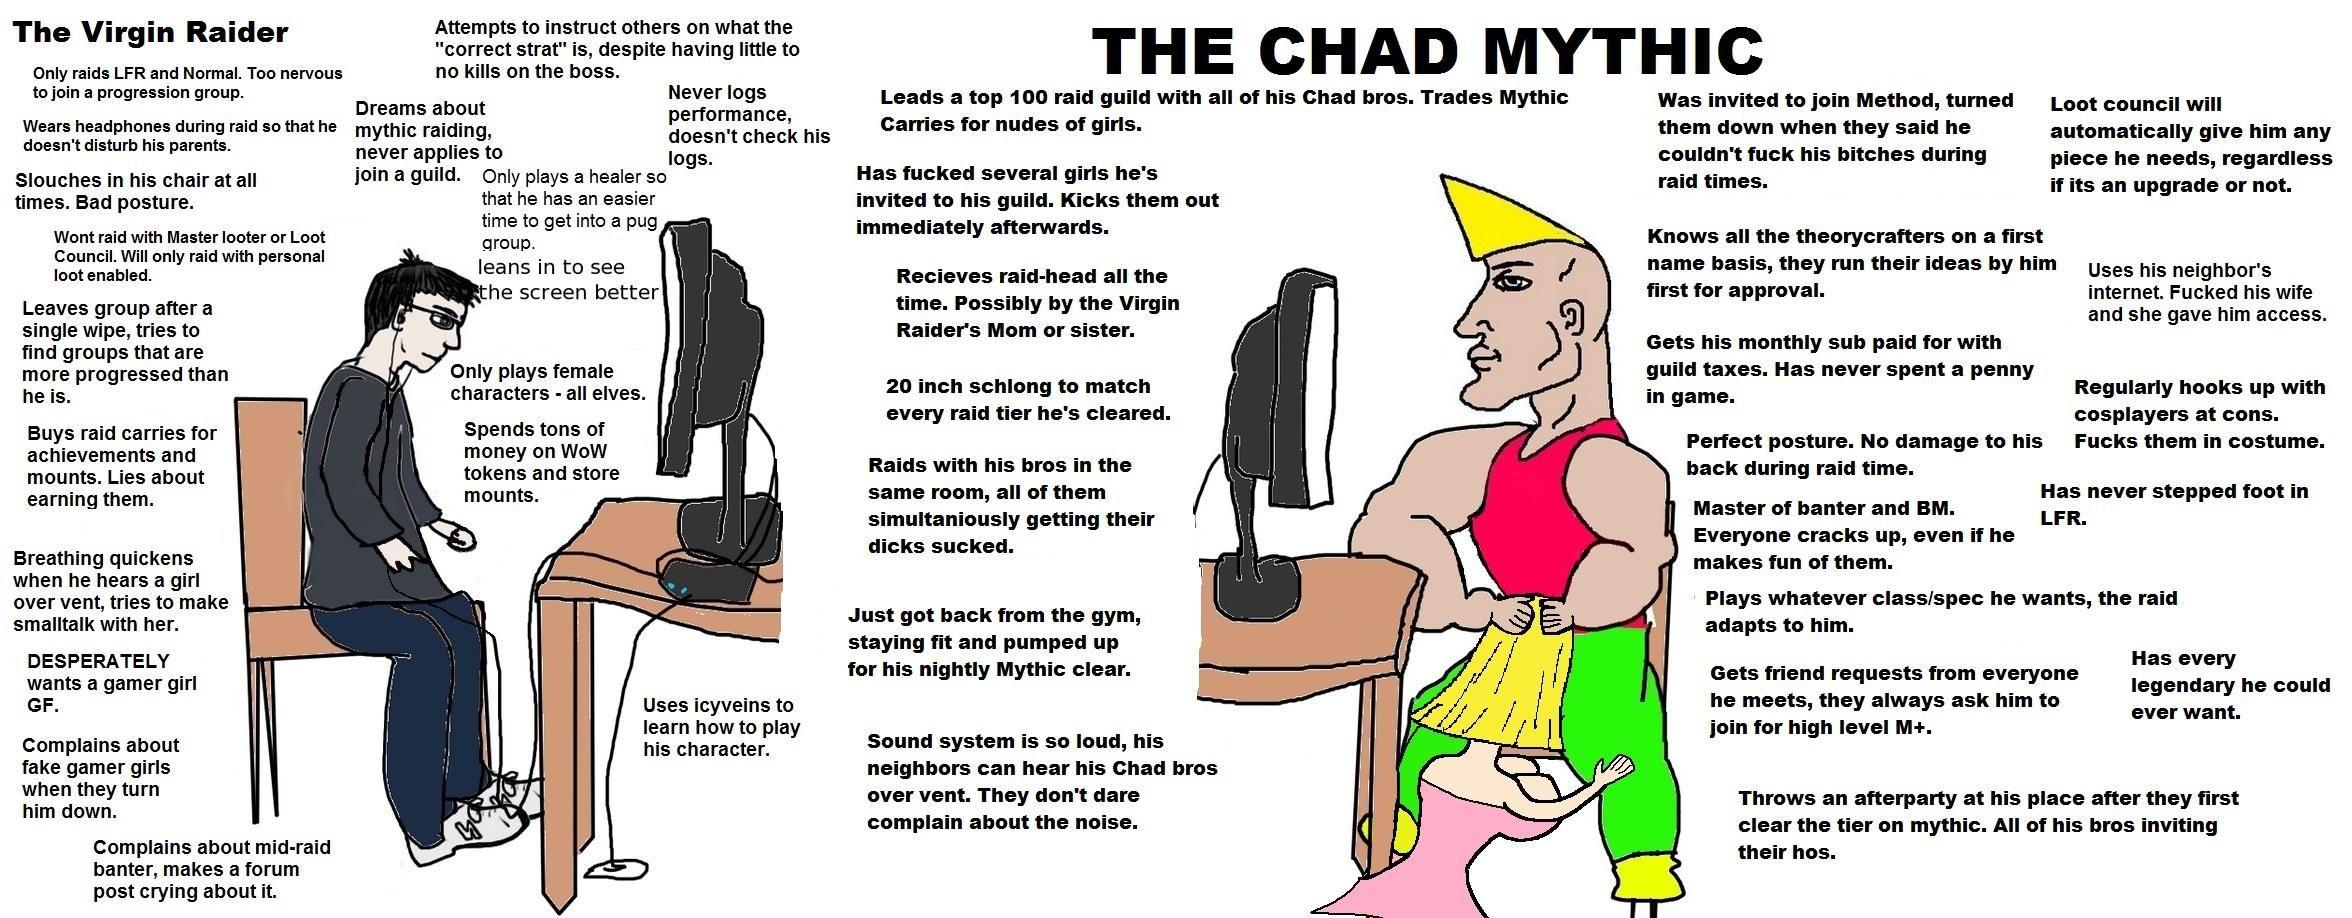 The Virgin Raider vs The Chad Mythic #worldofwarcraft